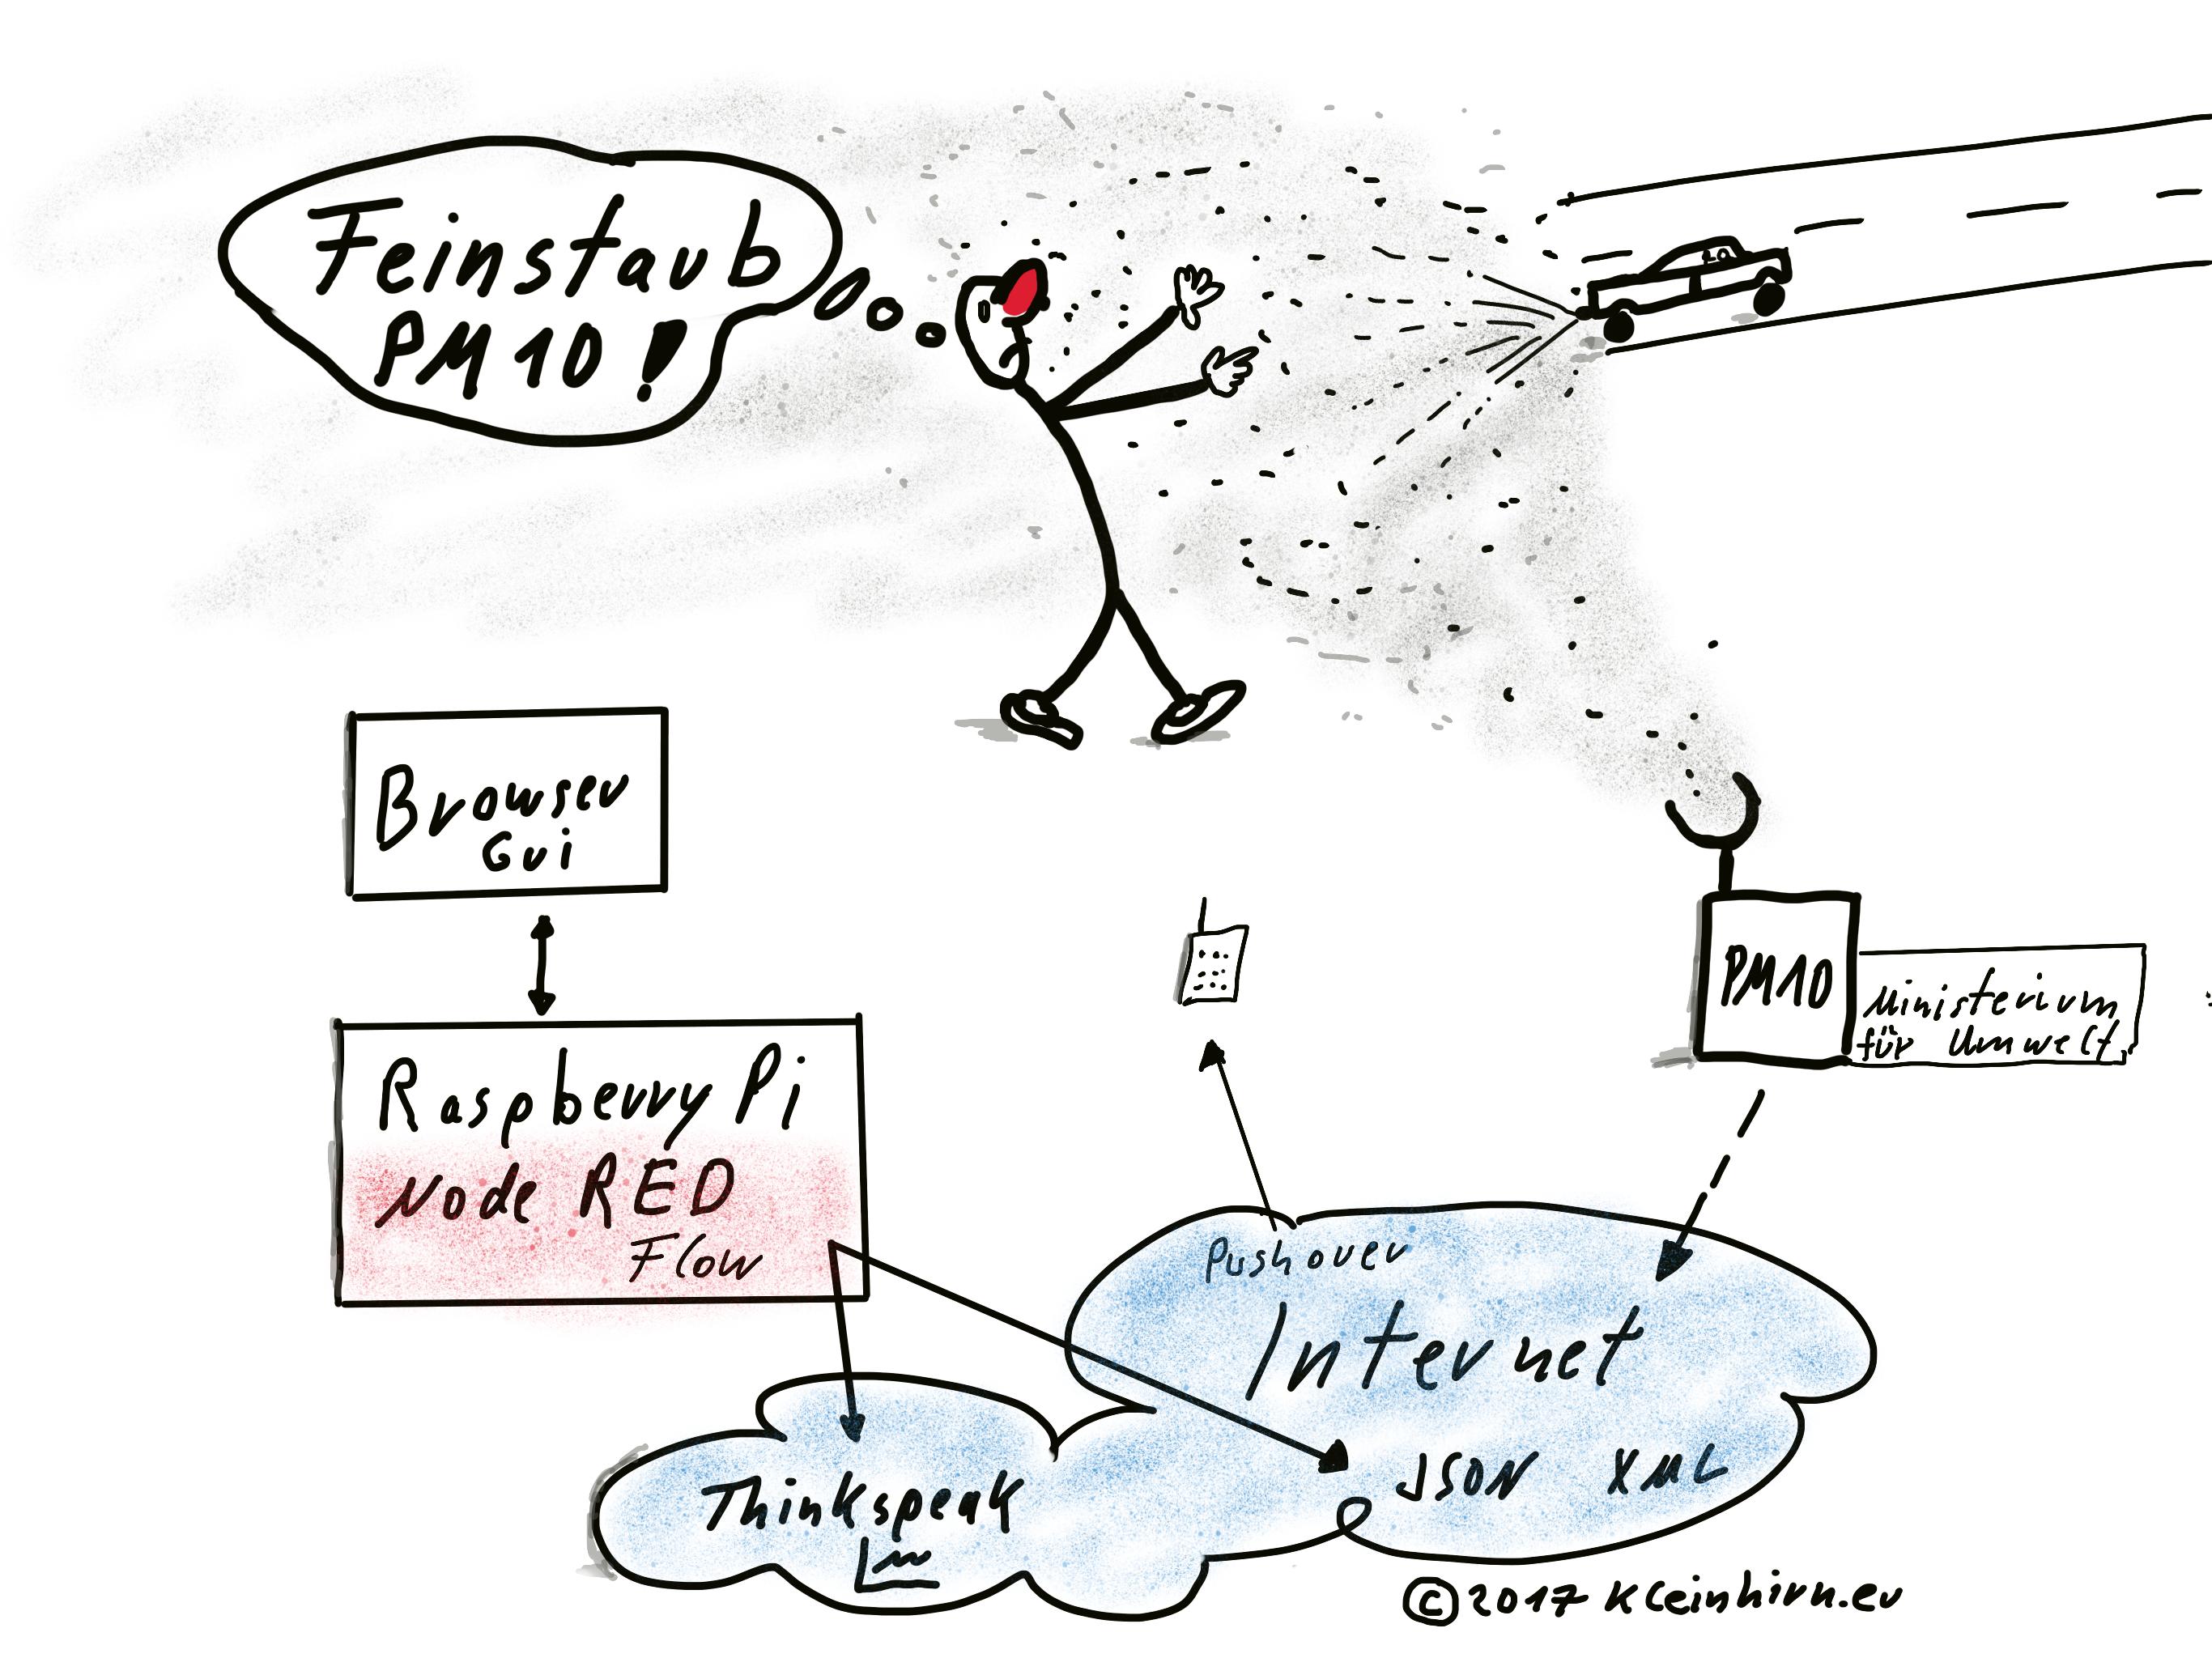 Feinstaub (Particulate Matter, Pył ) Messung mit dem